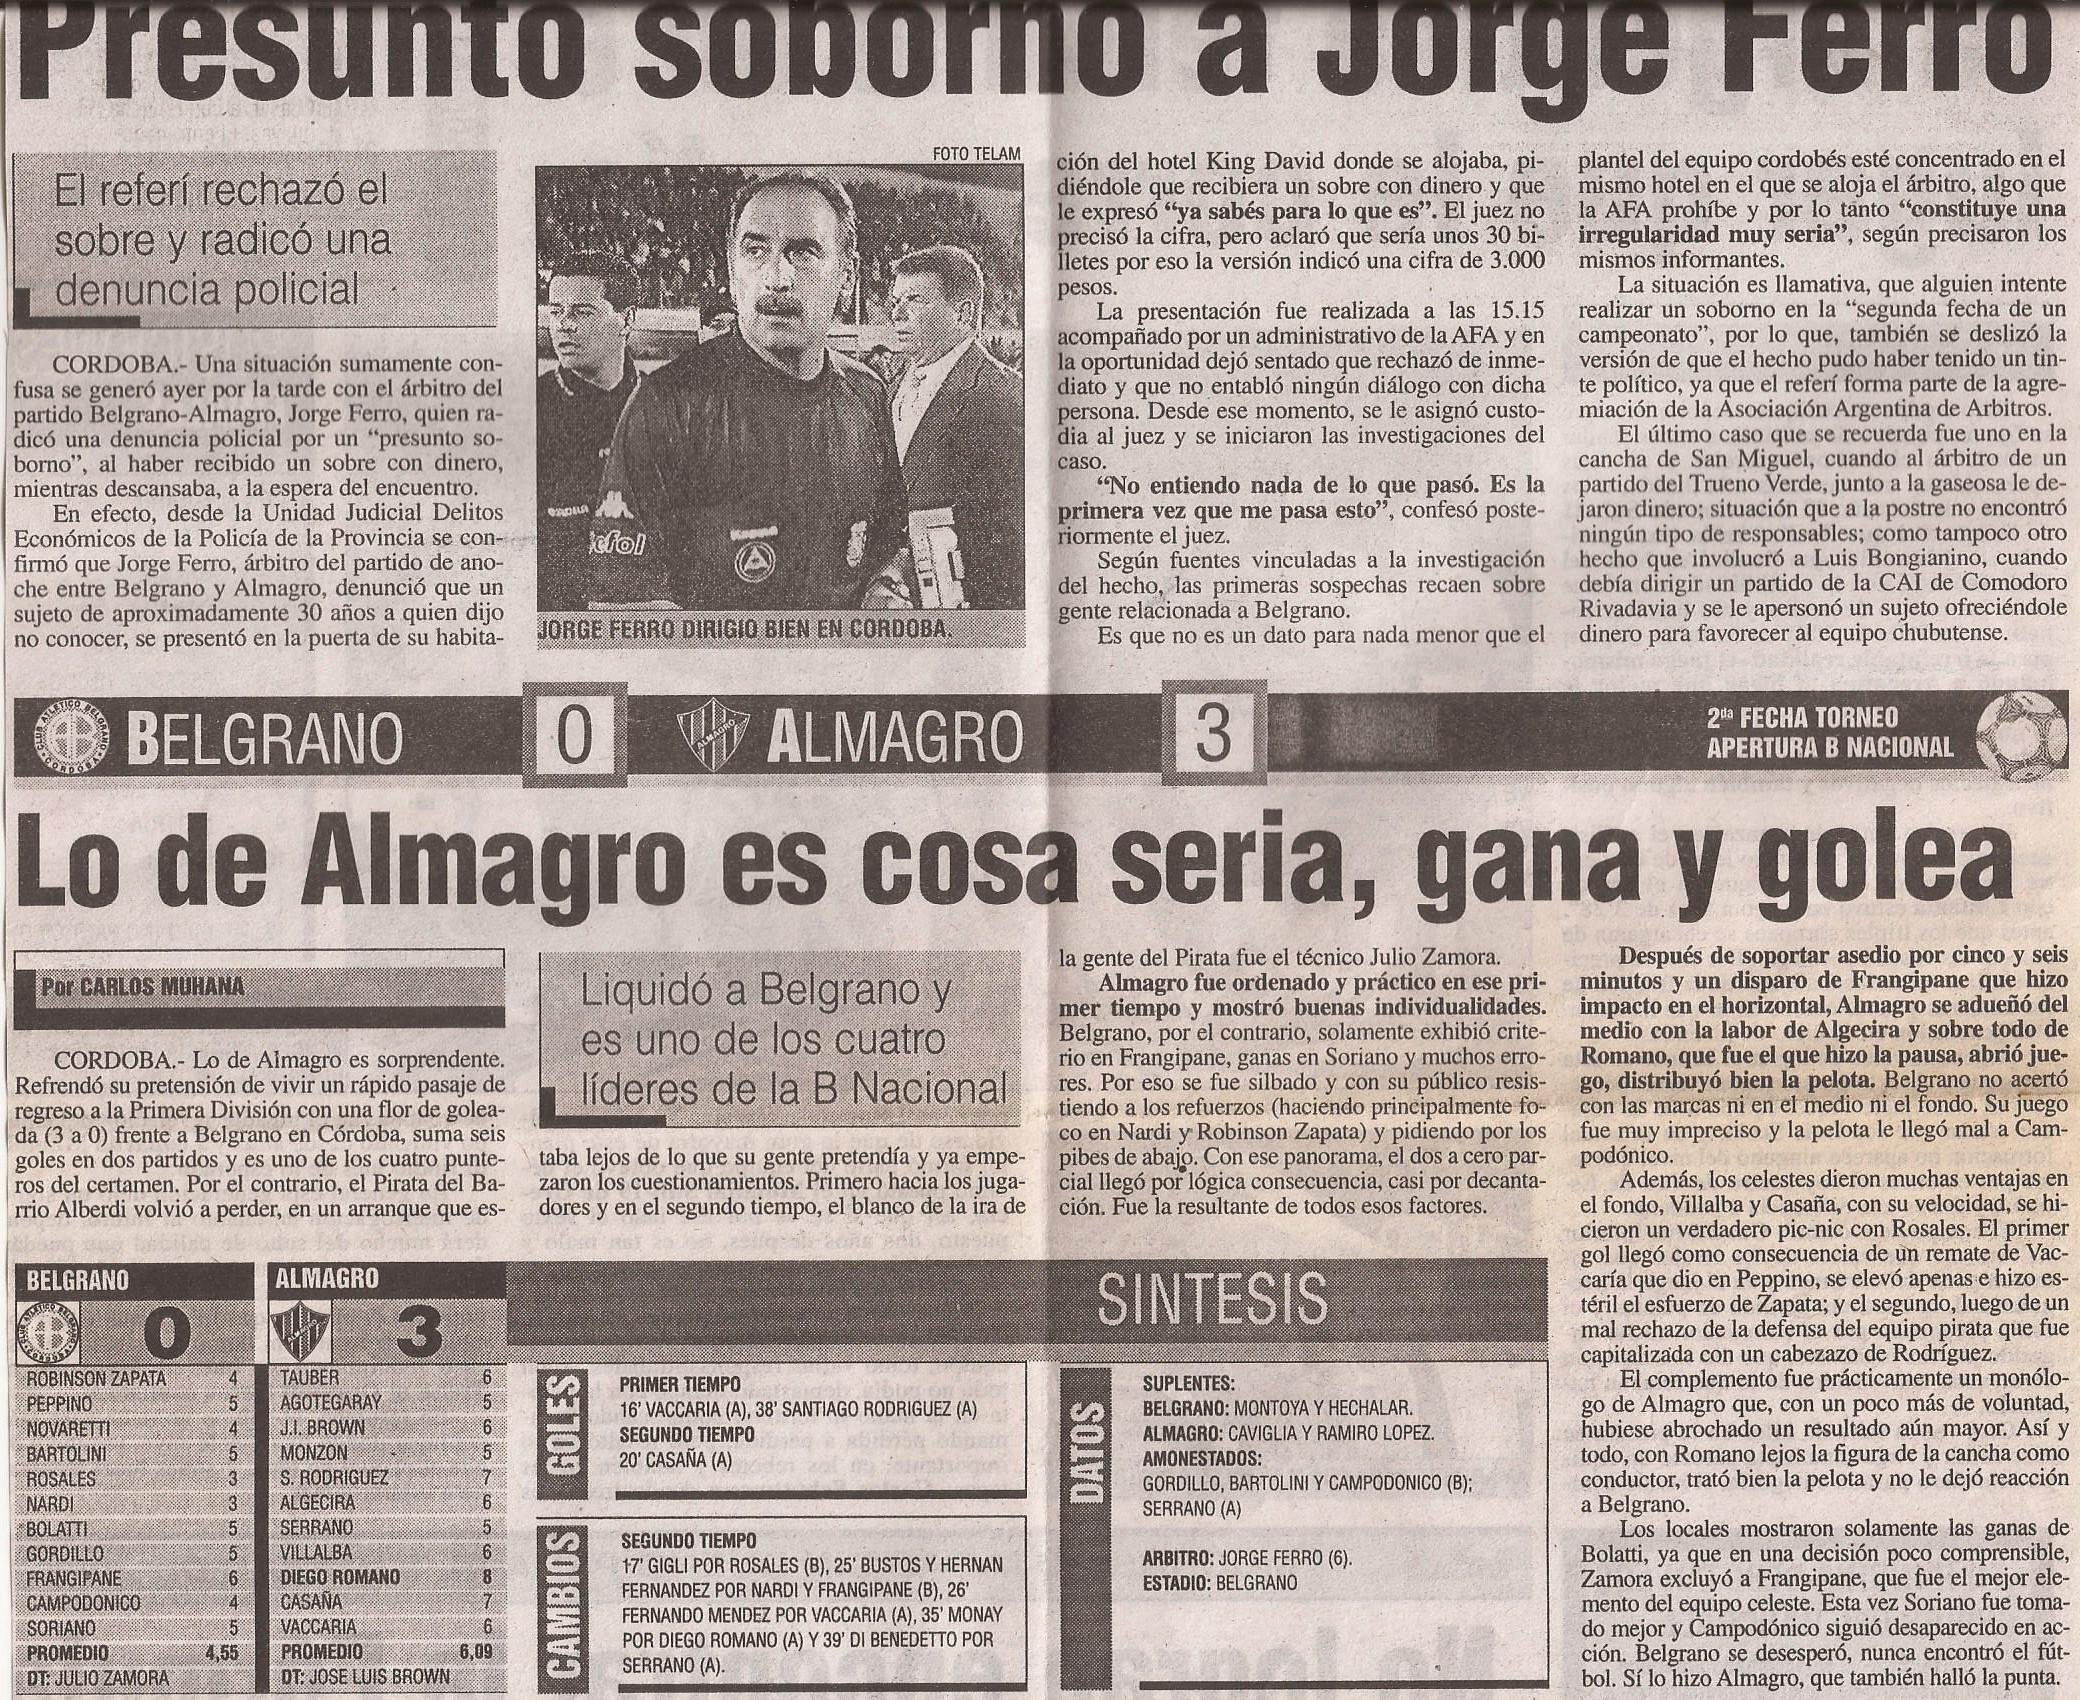 2005-06 Nacional B - Belgrano vs Almagro - Diario Popular